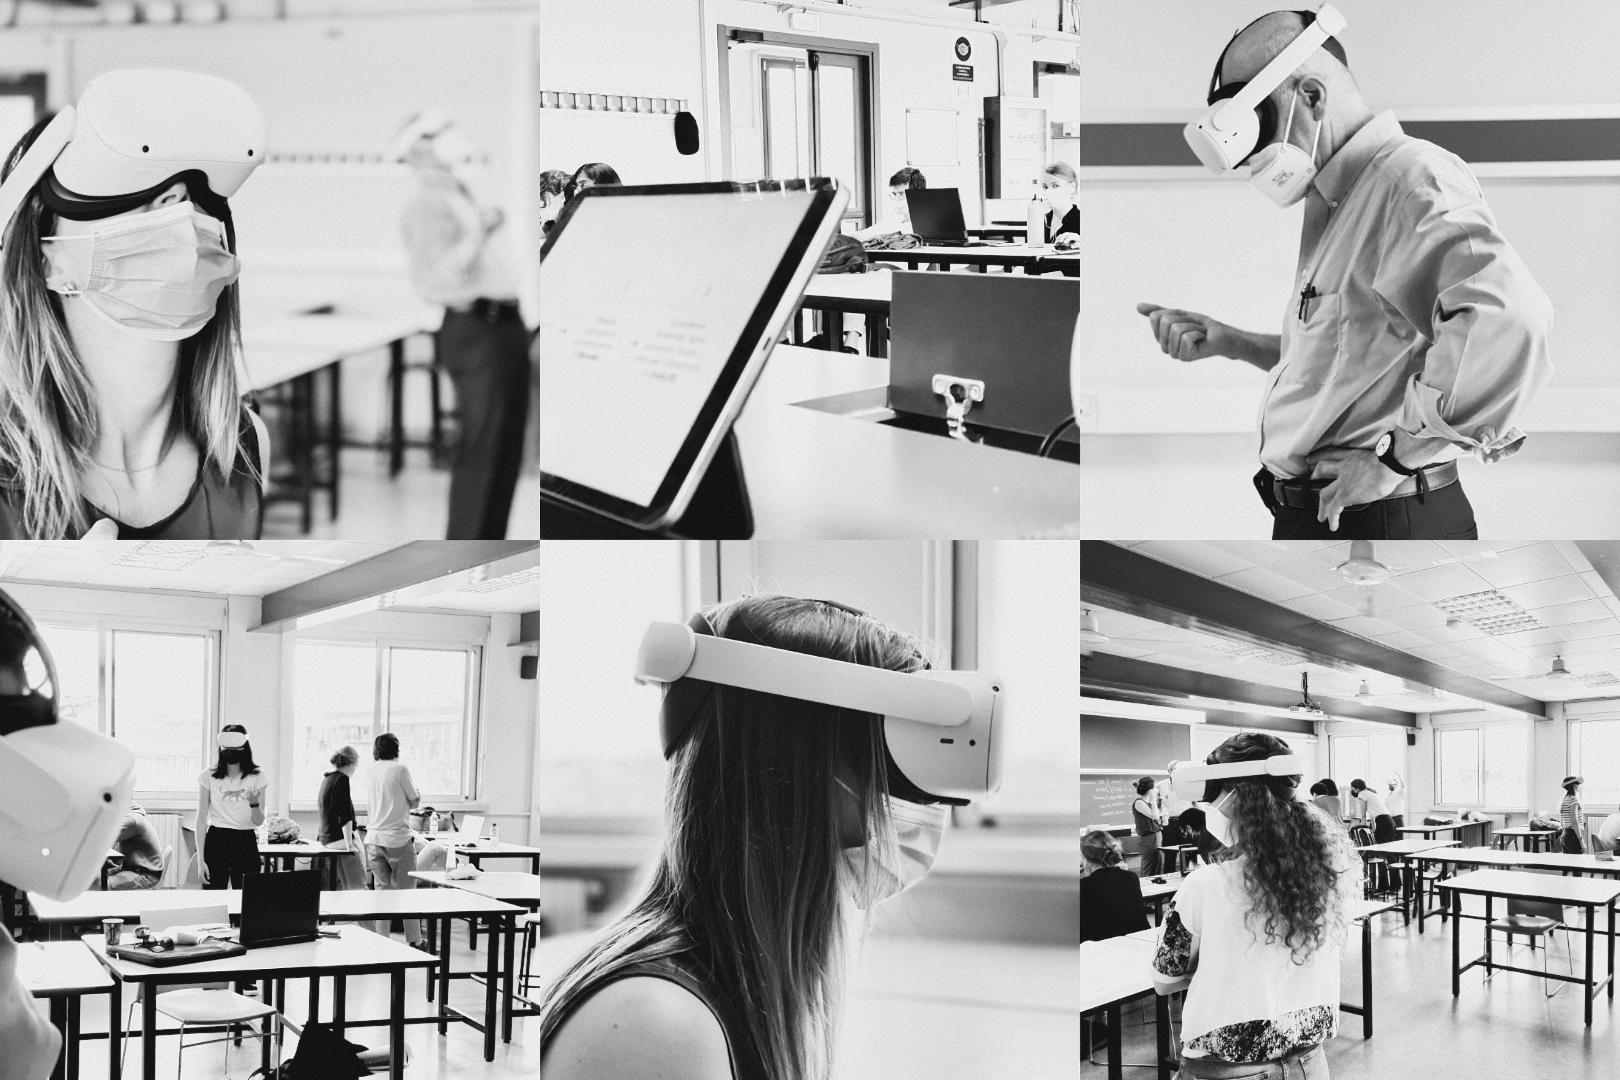 Maurizio Sabini at Politecnico di Milano: Using VR in Teaching